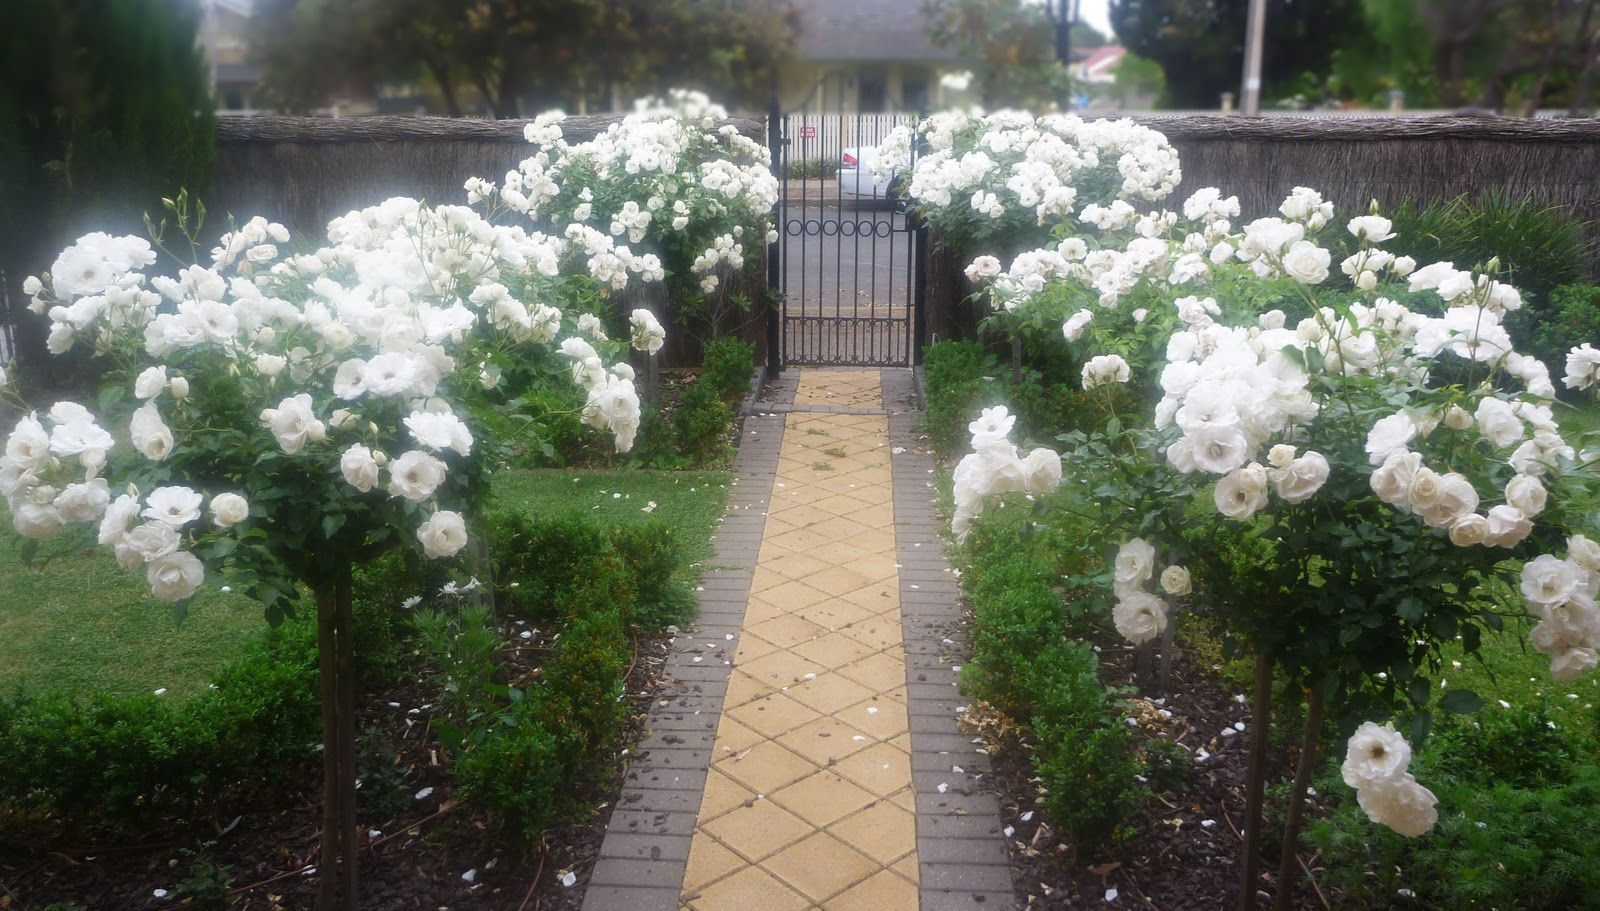 standard rose 'iceburg' this white blooming variety stays